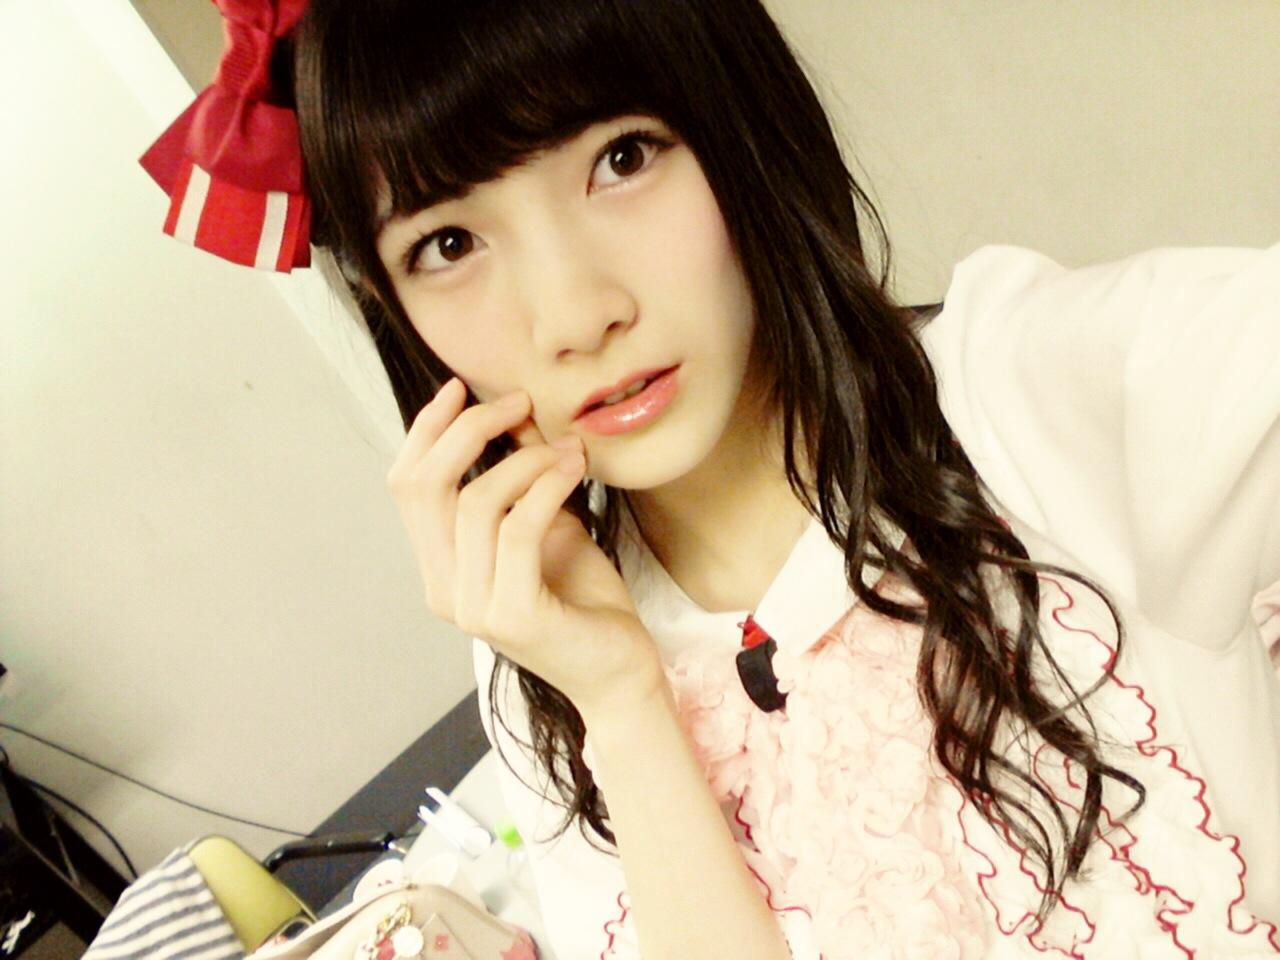 Okada Nana - AKB48 Photo (37801320) - Fanpop